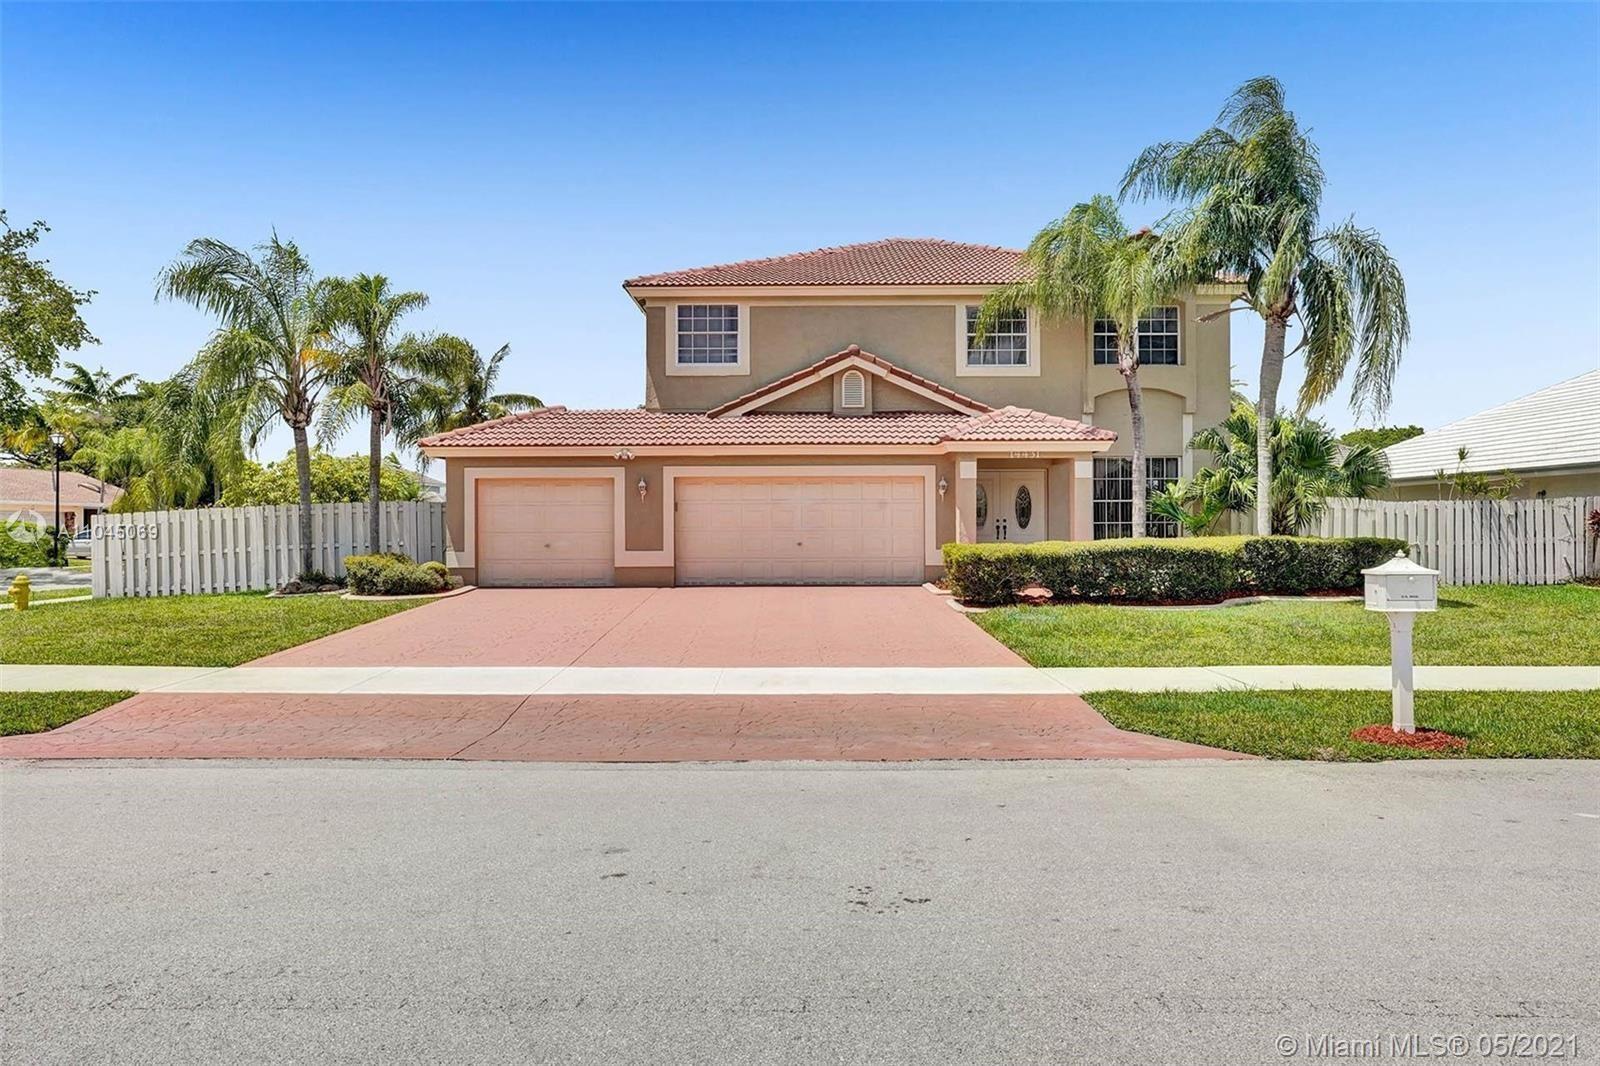 14431 Greenbriar Manor, Davie, FL 33325 - #: A11045069